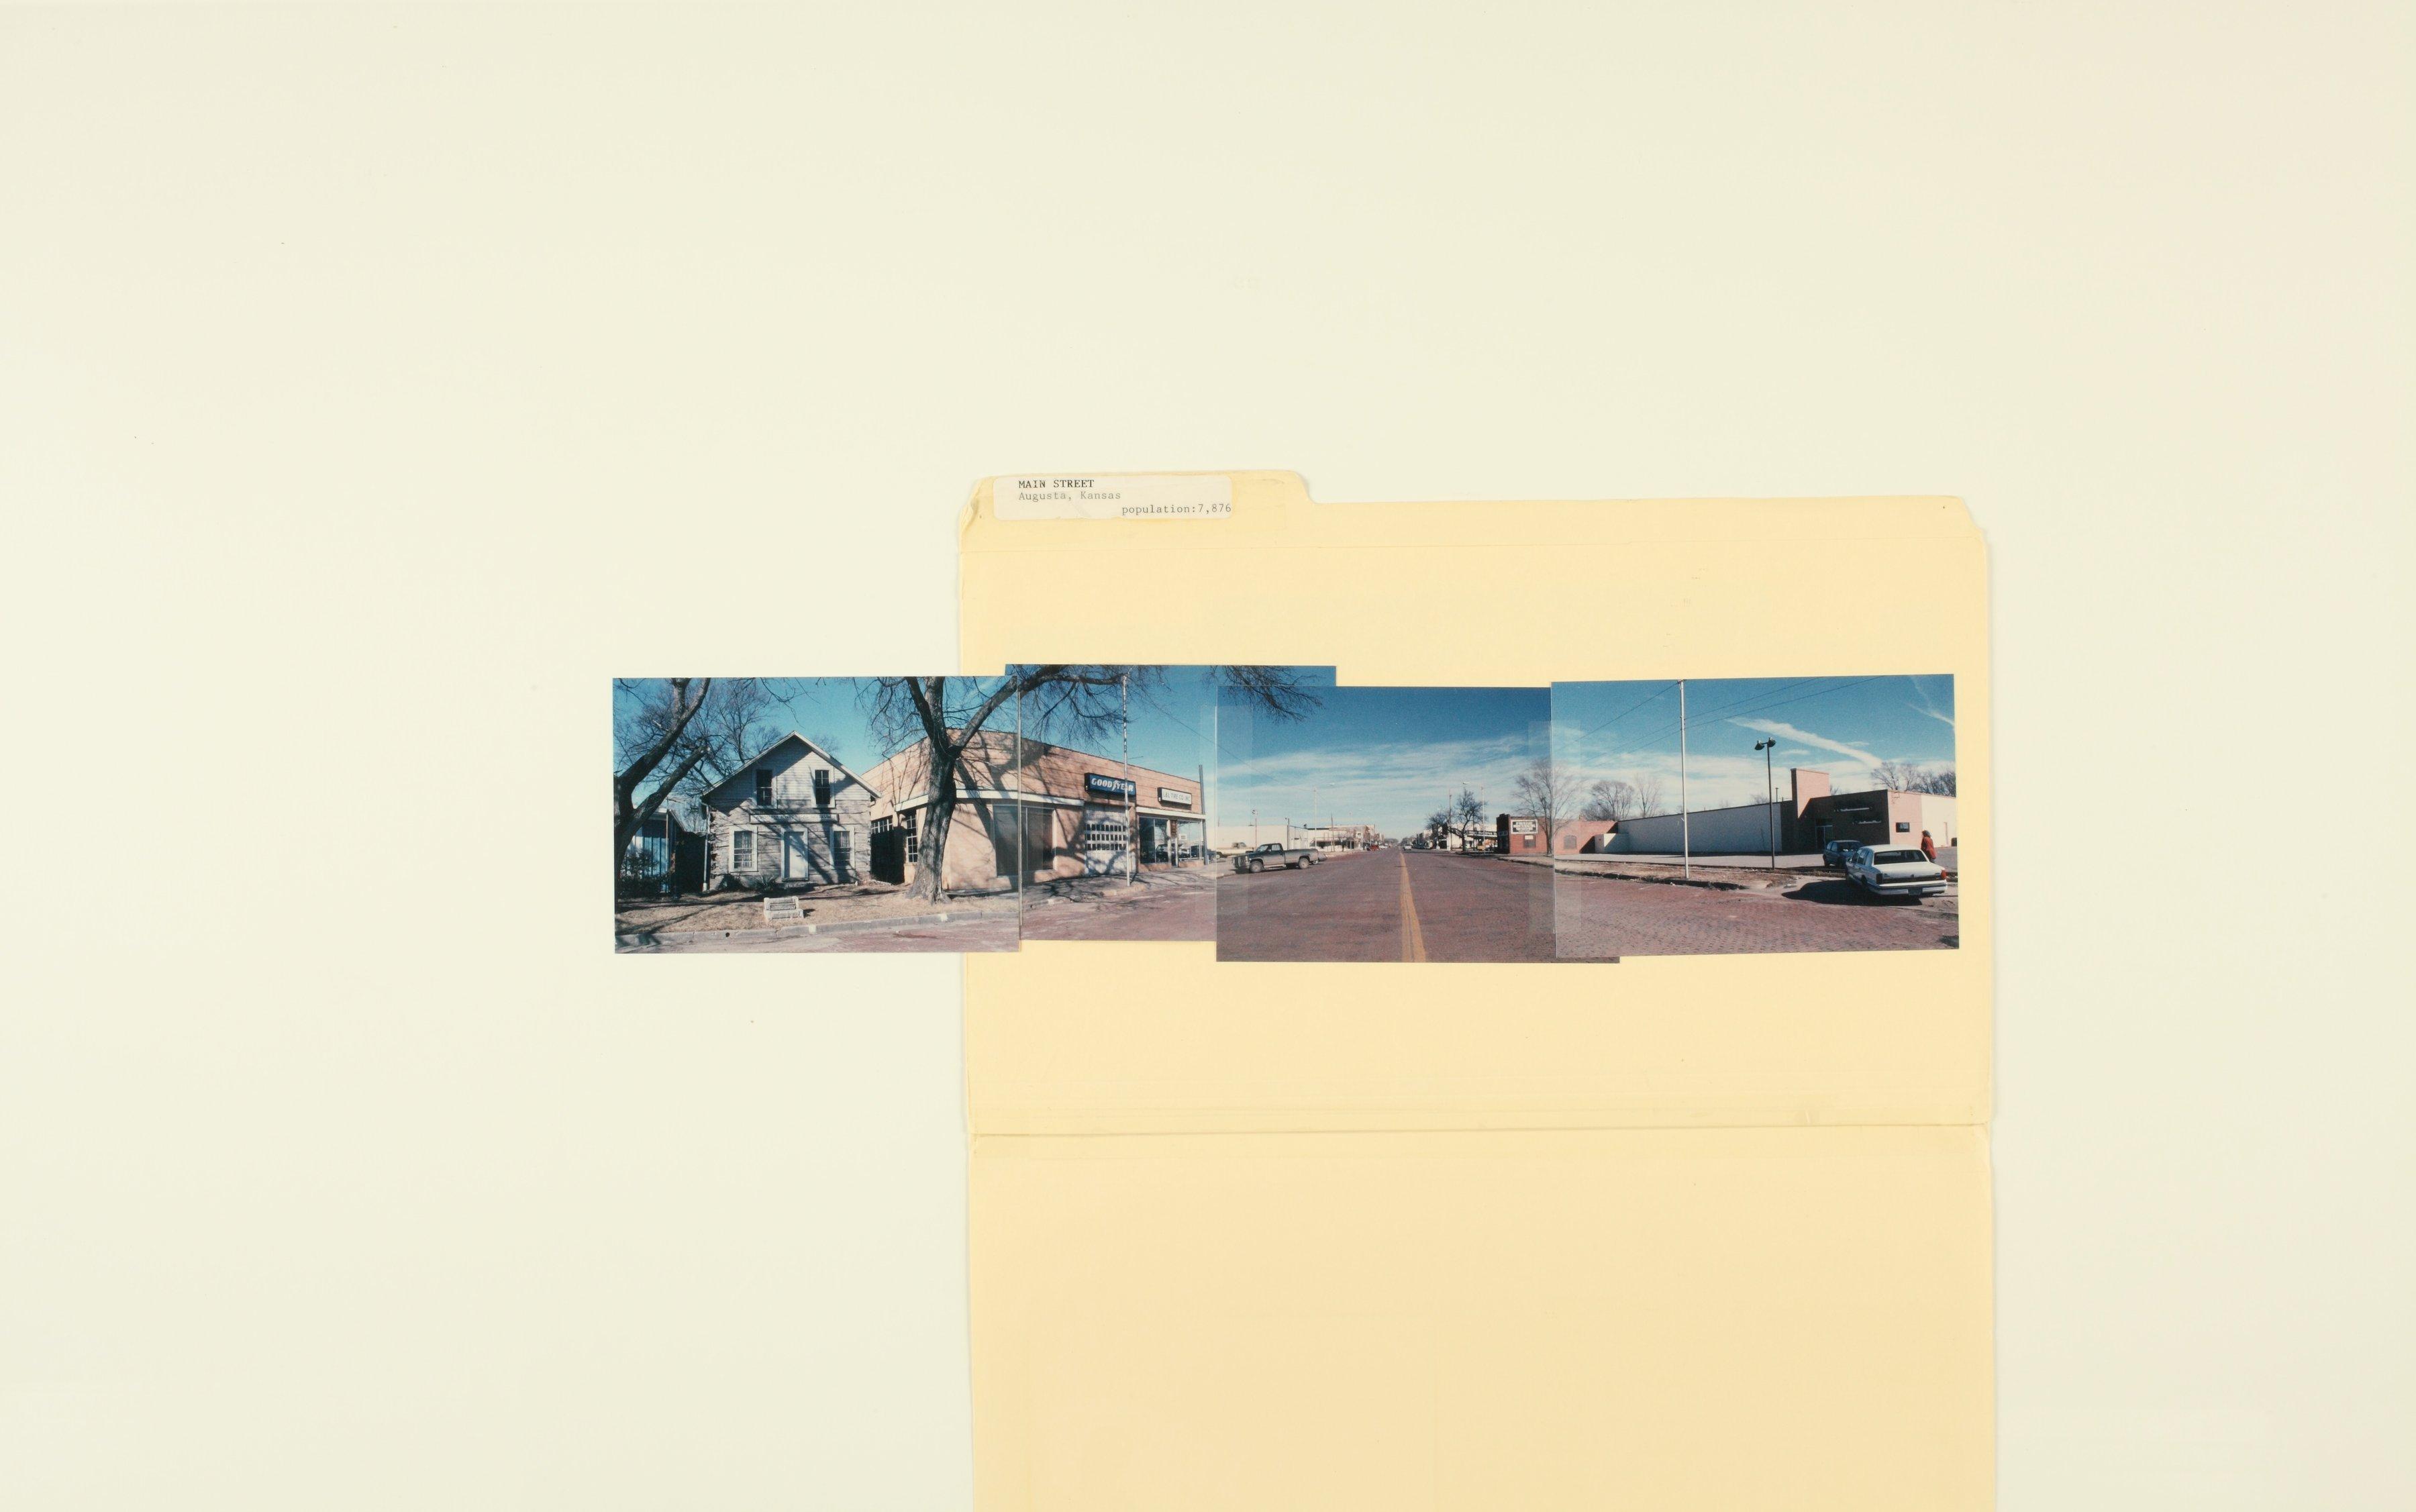 Kansas Film Commission site photographs, towns Ada - Bunker Hill - 10